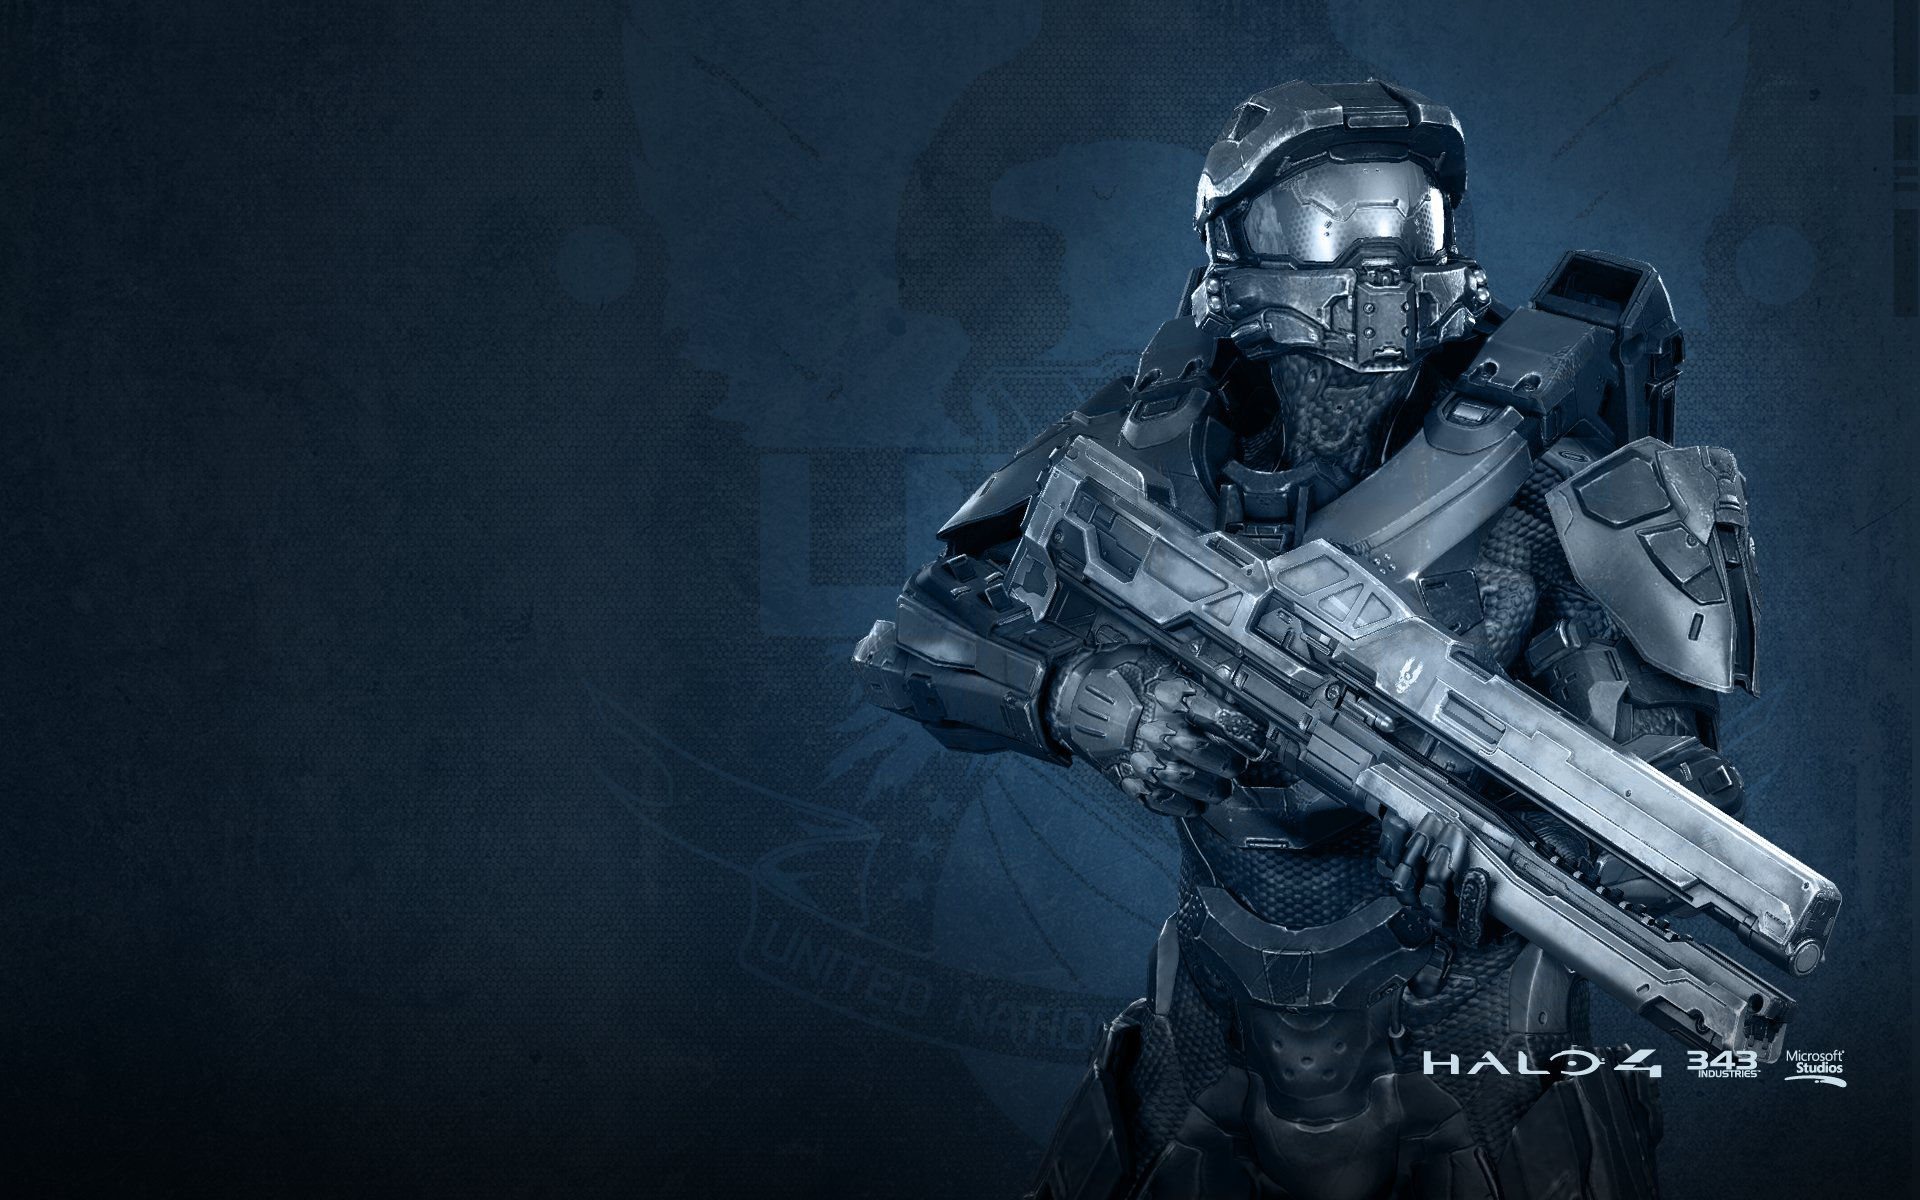 Halo Spartan Helmet Wallpaper